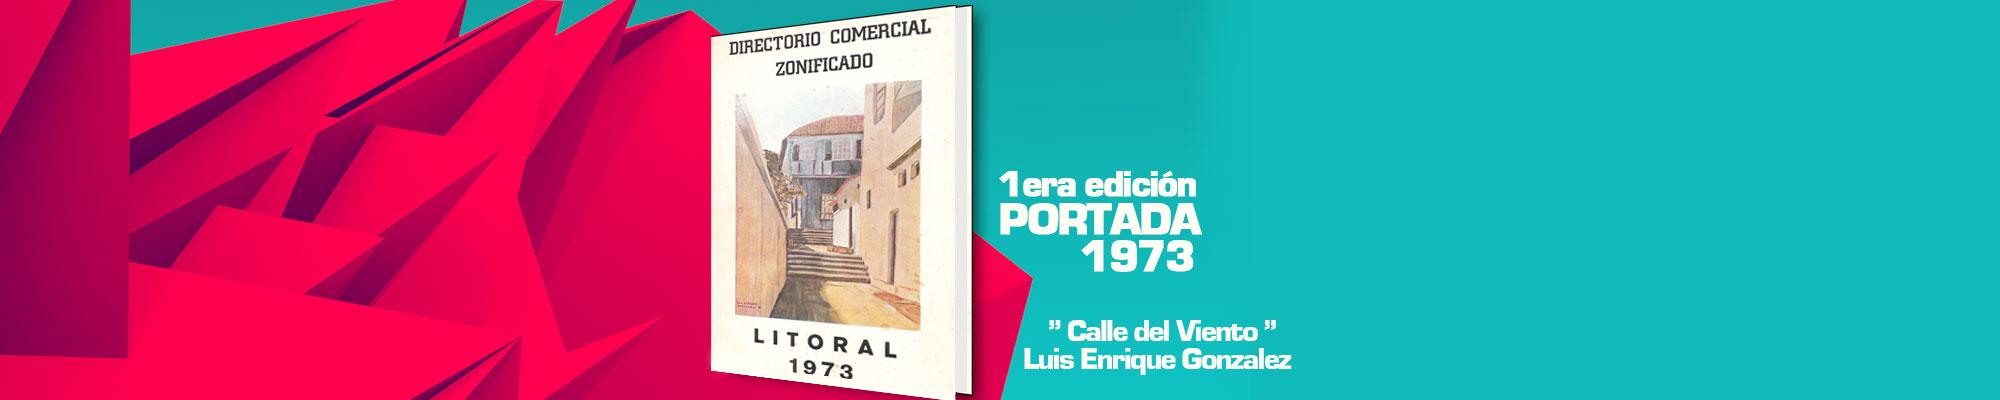 litocen-1973-primera-edicion